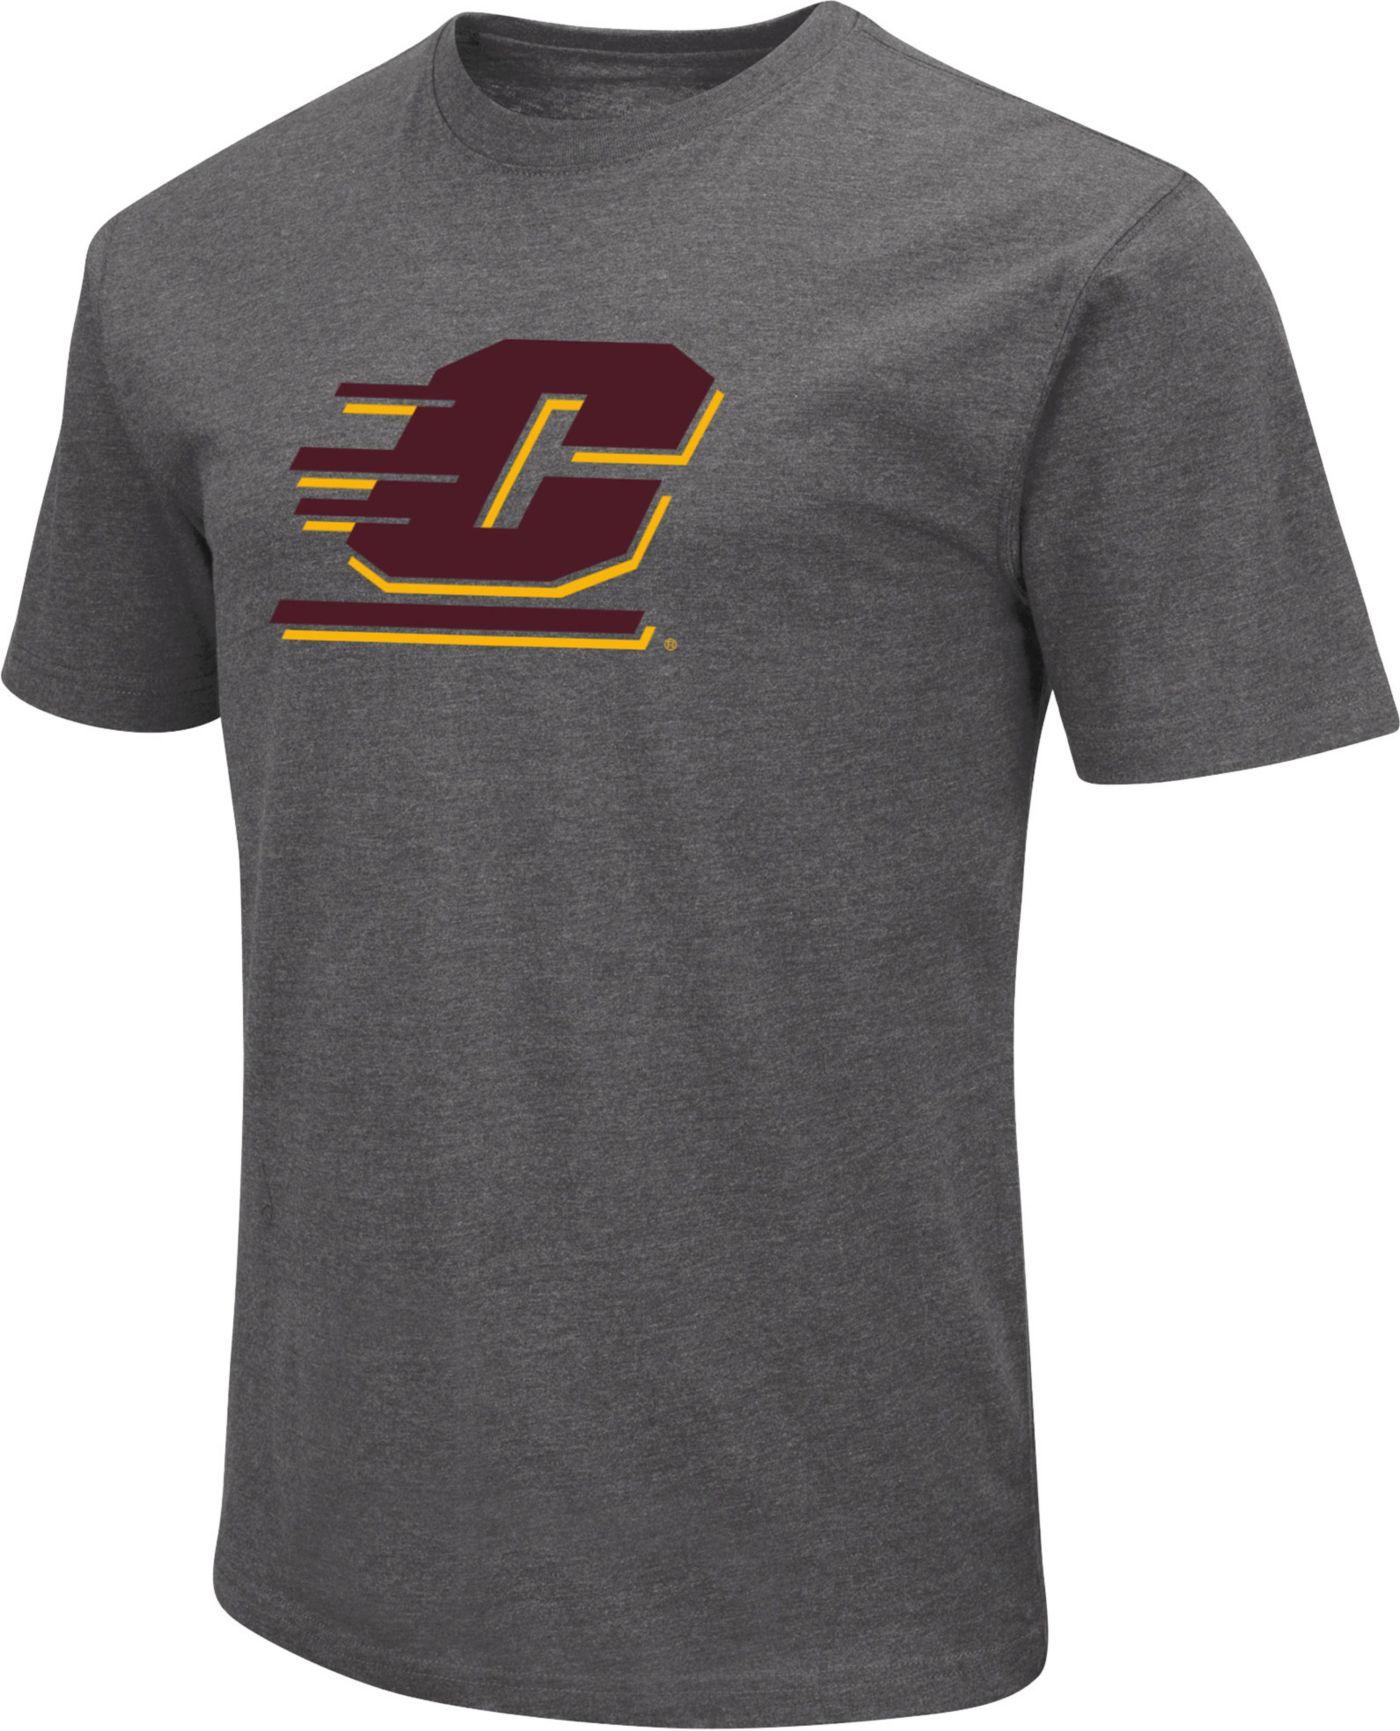 Colosseum Men's Central Michigan Chippewas Grey Dual Blend T-Shirt